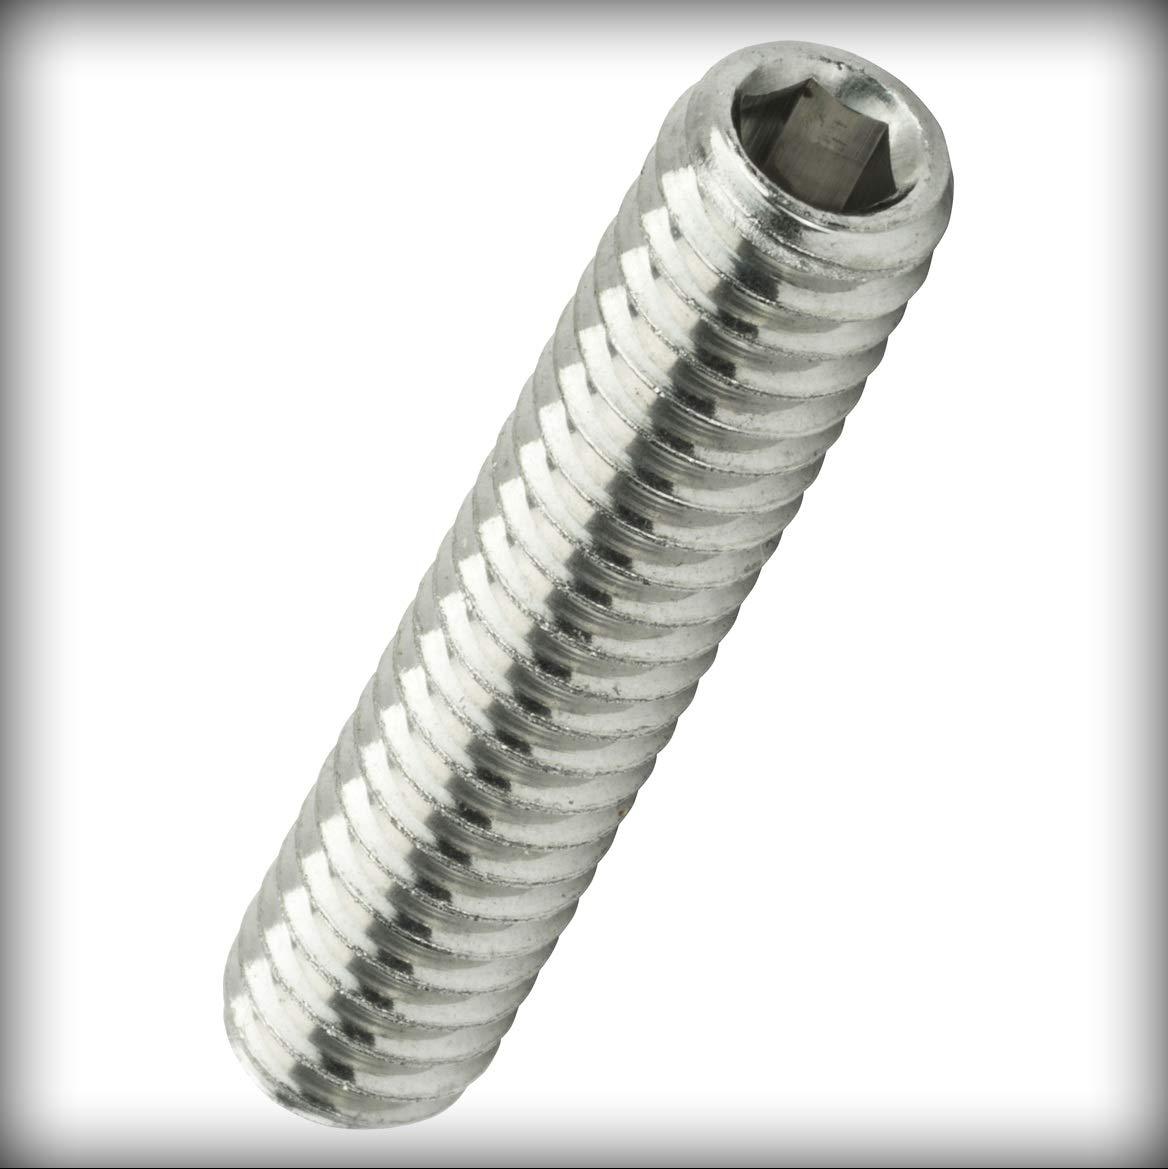 8-32 x 1-inch Socket Set Screws Set Allen Drive Cup Point Stainless Steel Pack of 1000 Warranity by Pr-Merchant